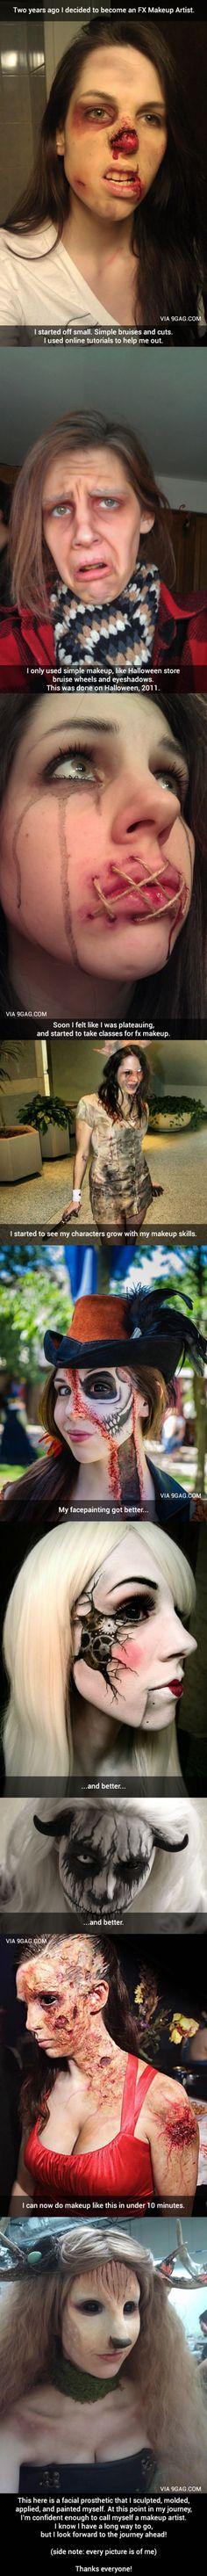 My Journey To Becoming An FX Makeup Artist